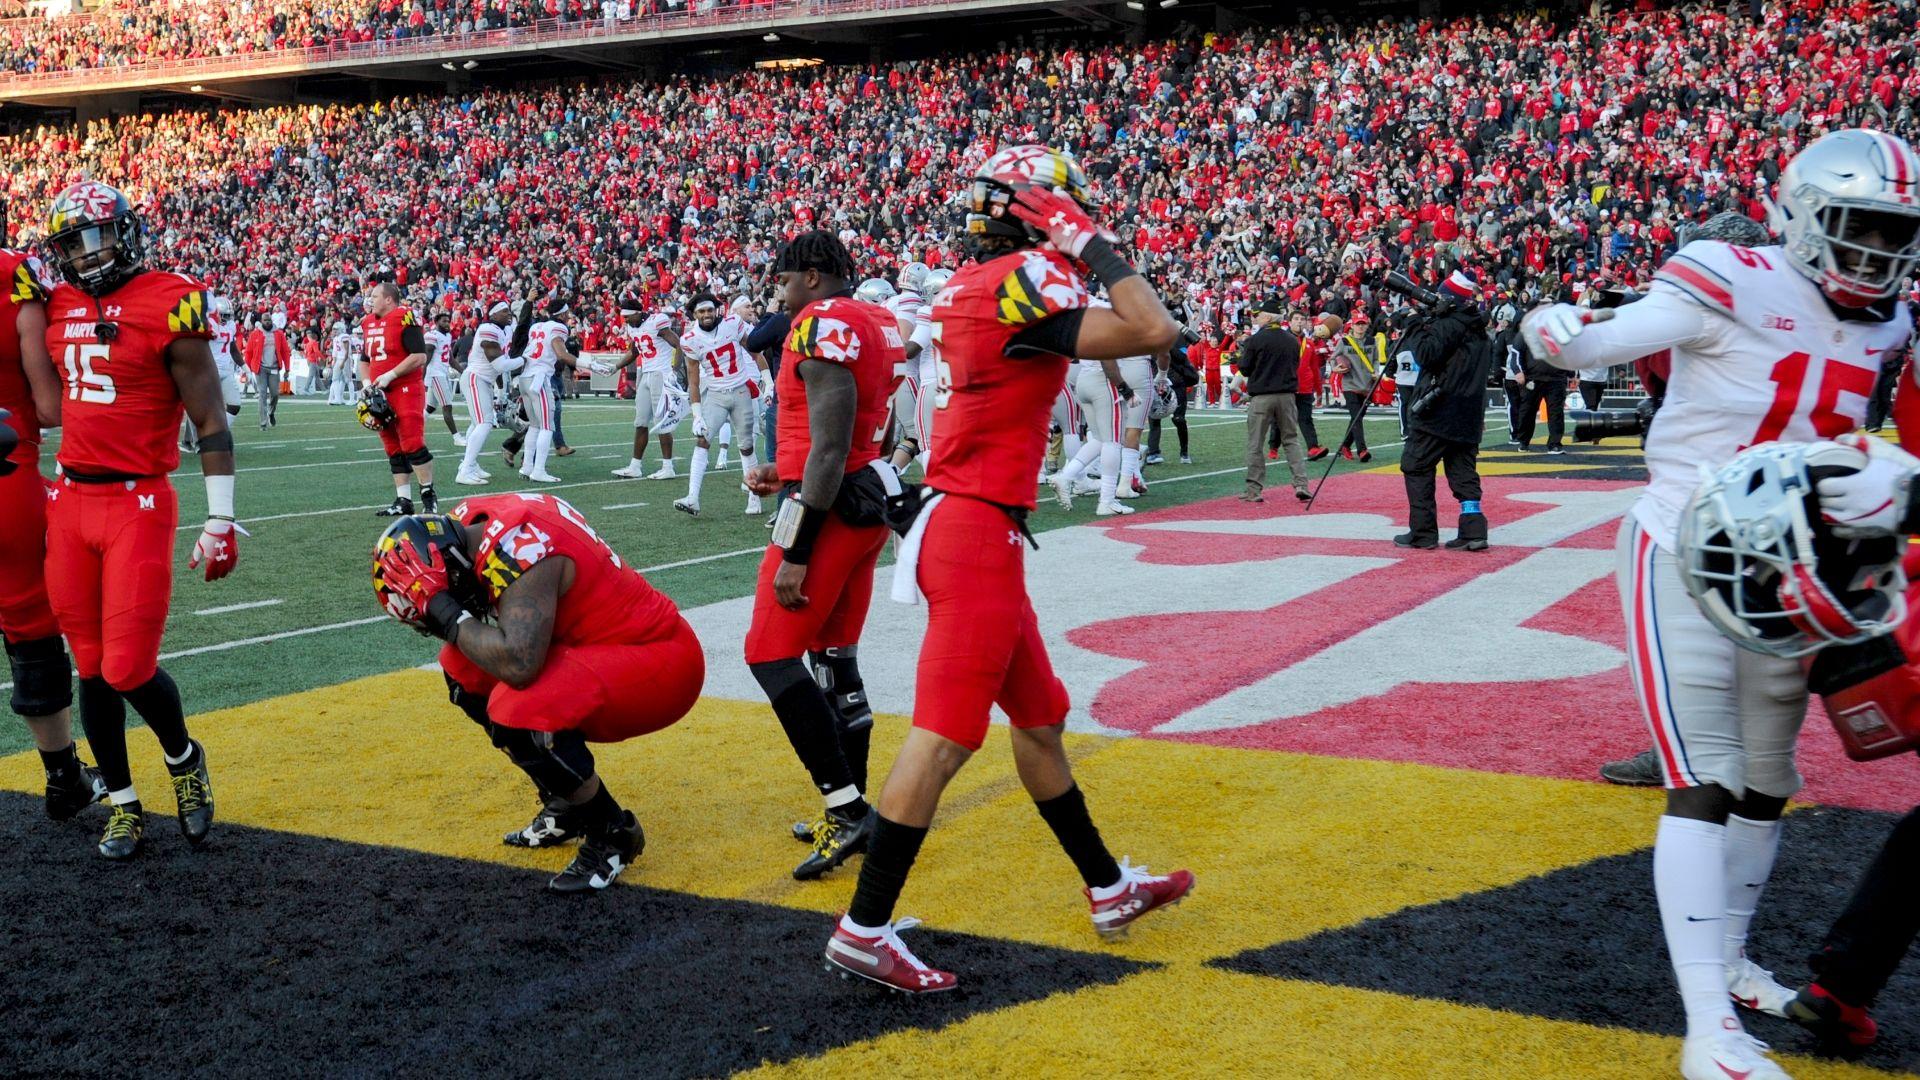 Urban Meyer: Won't win vs. Michigan unless defense gets better